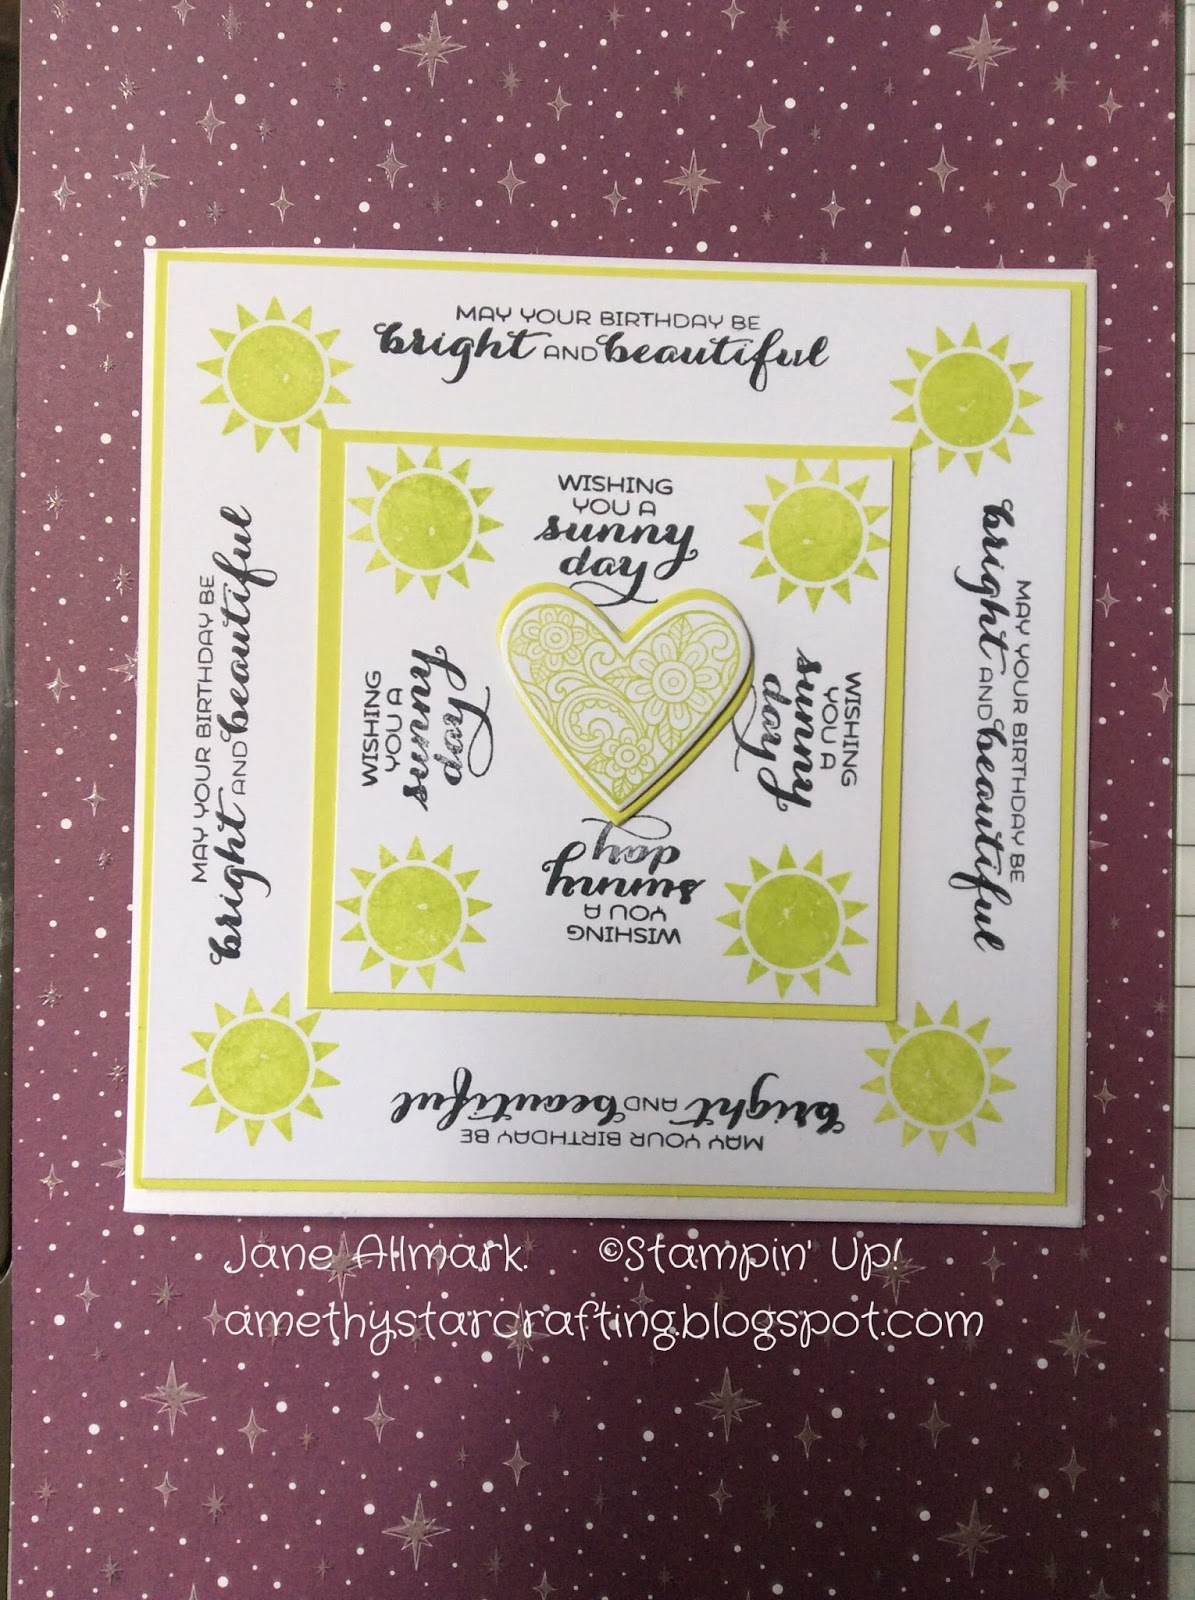 Amethystar Crafting Stampin Up Stamparatus Sunshine Wishes Sunny